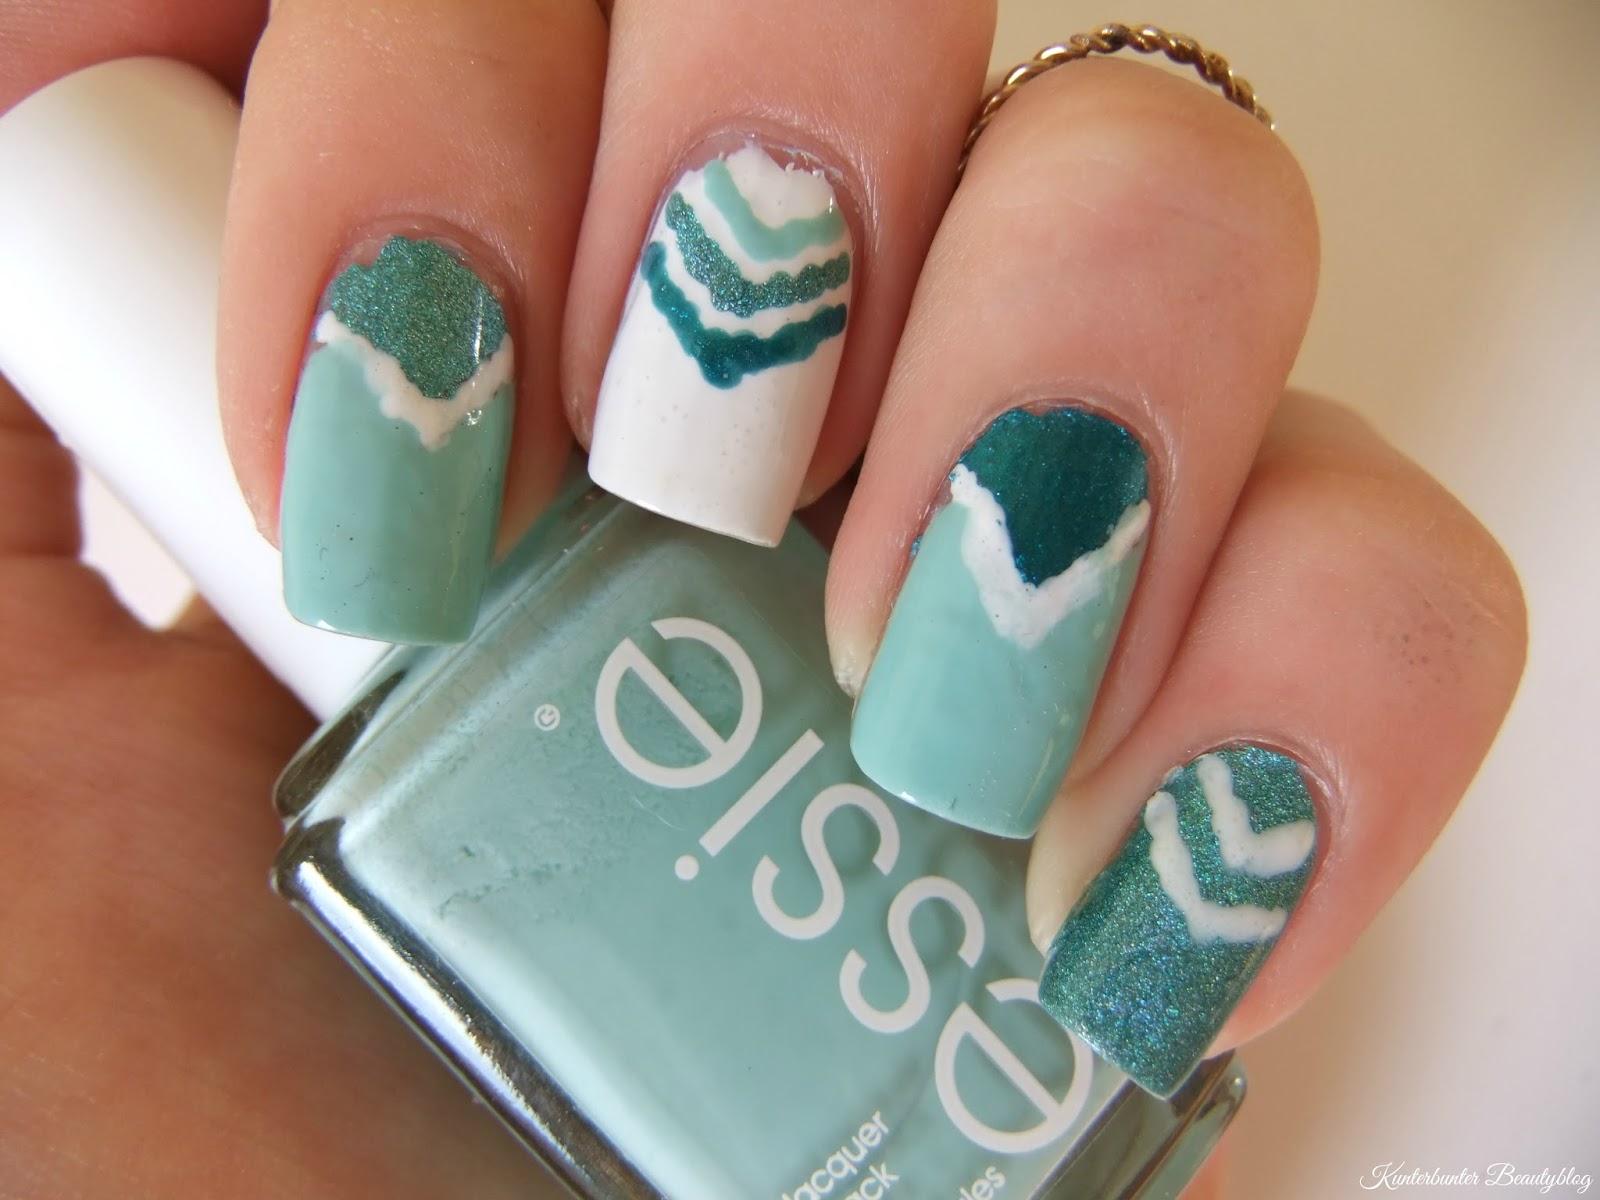 Sommer-Dreiecks-Nageldesign - Kunterbunter Beautyblog